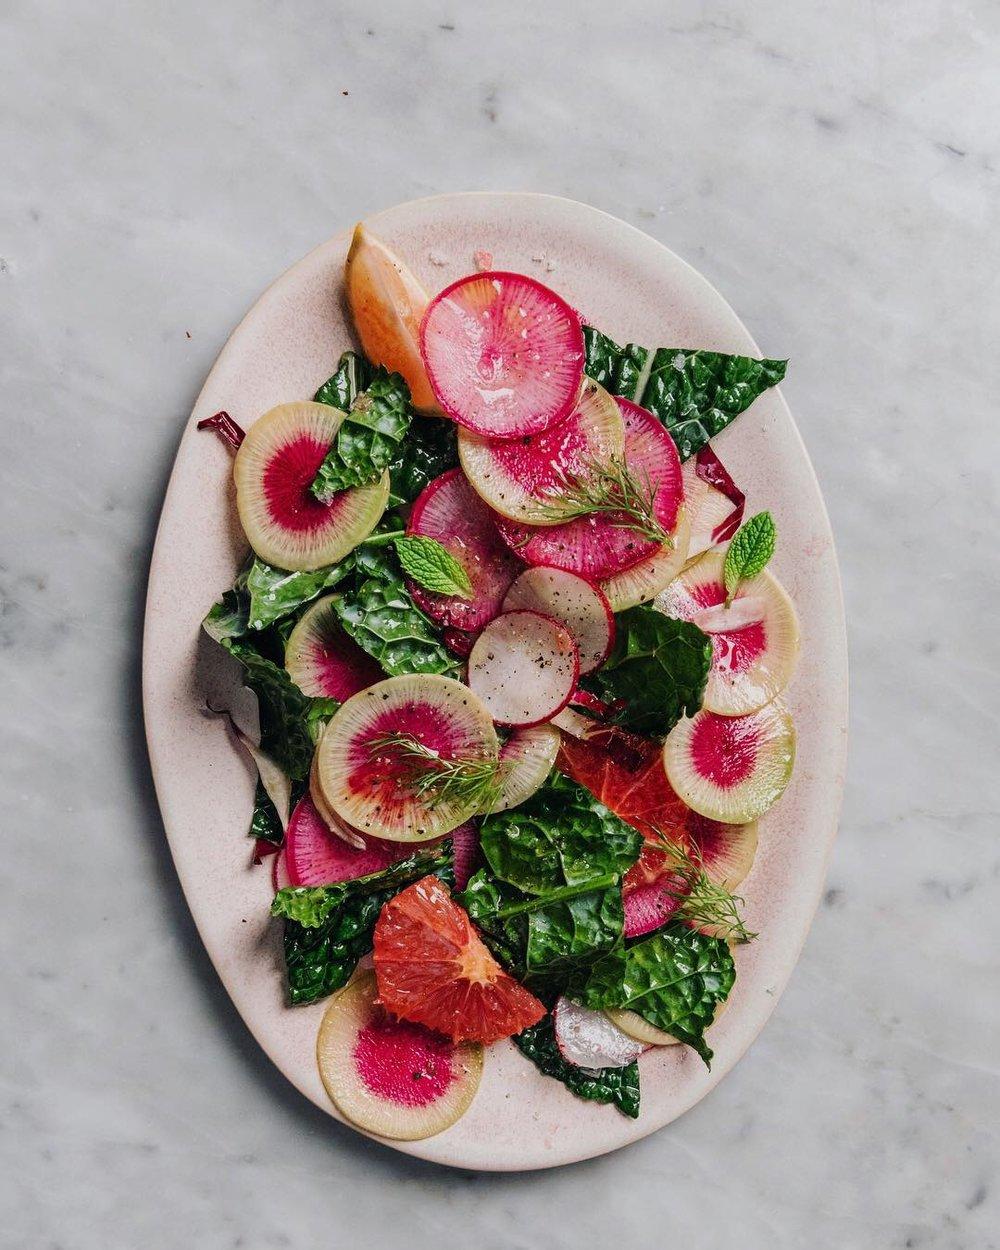 WINTER RADISH AND KALE SALAD WITH CITRUS AND HERBS #recipe #easyrecipe #wintersalads #watermelonradish #foodstyling